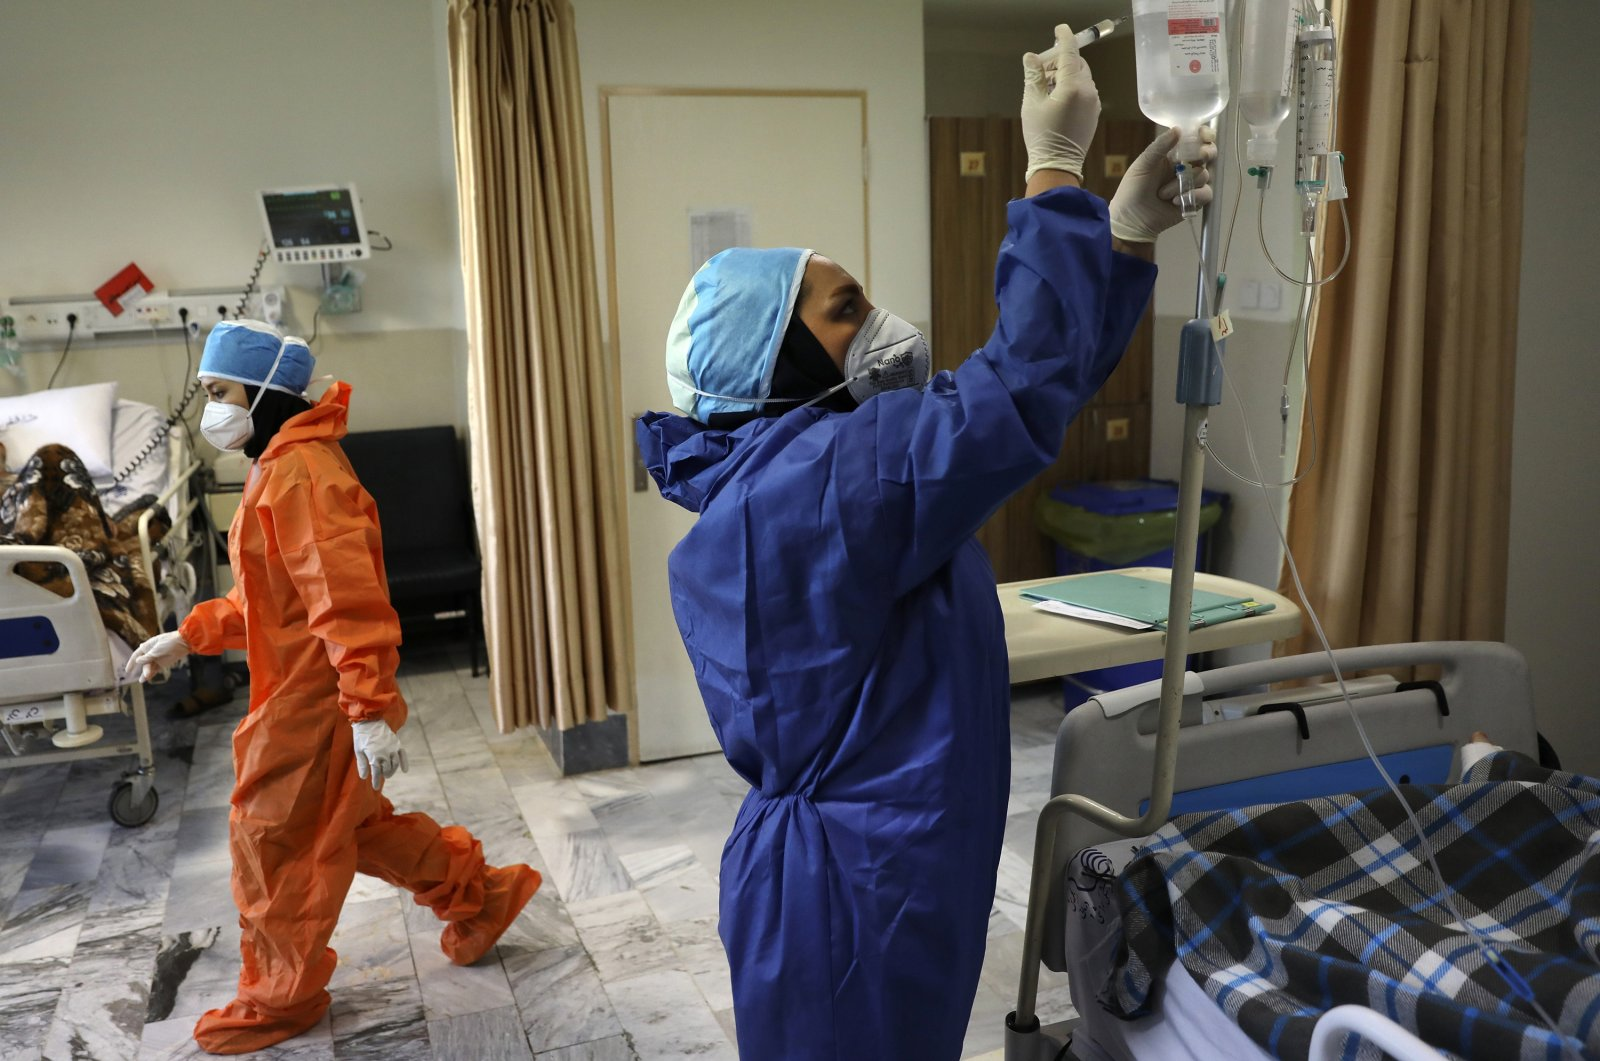 Nurses tend to COVID-19 patients at the Shohadaye Tajrish Hospital in Tehran, Iran, on June 16, 2020. (AP Photo)